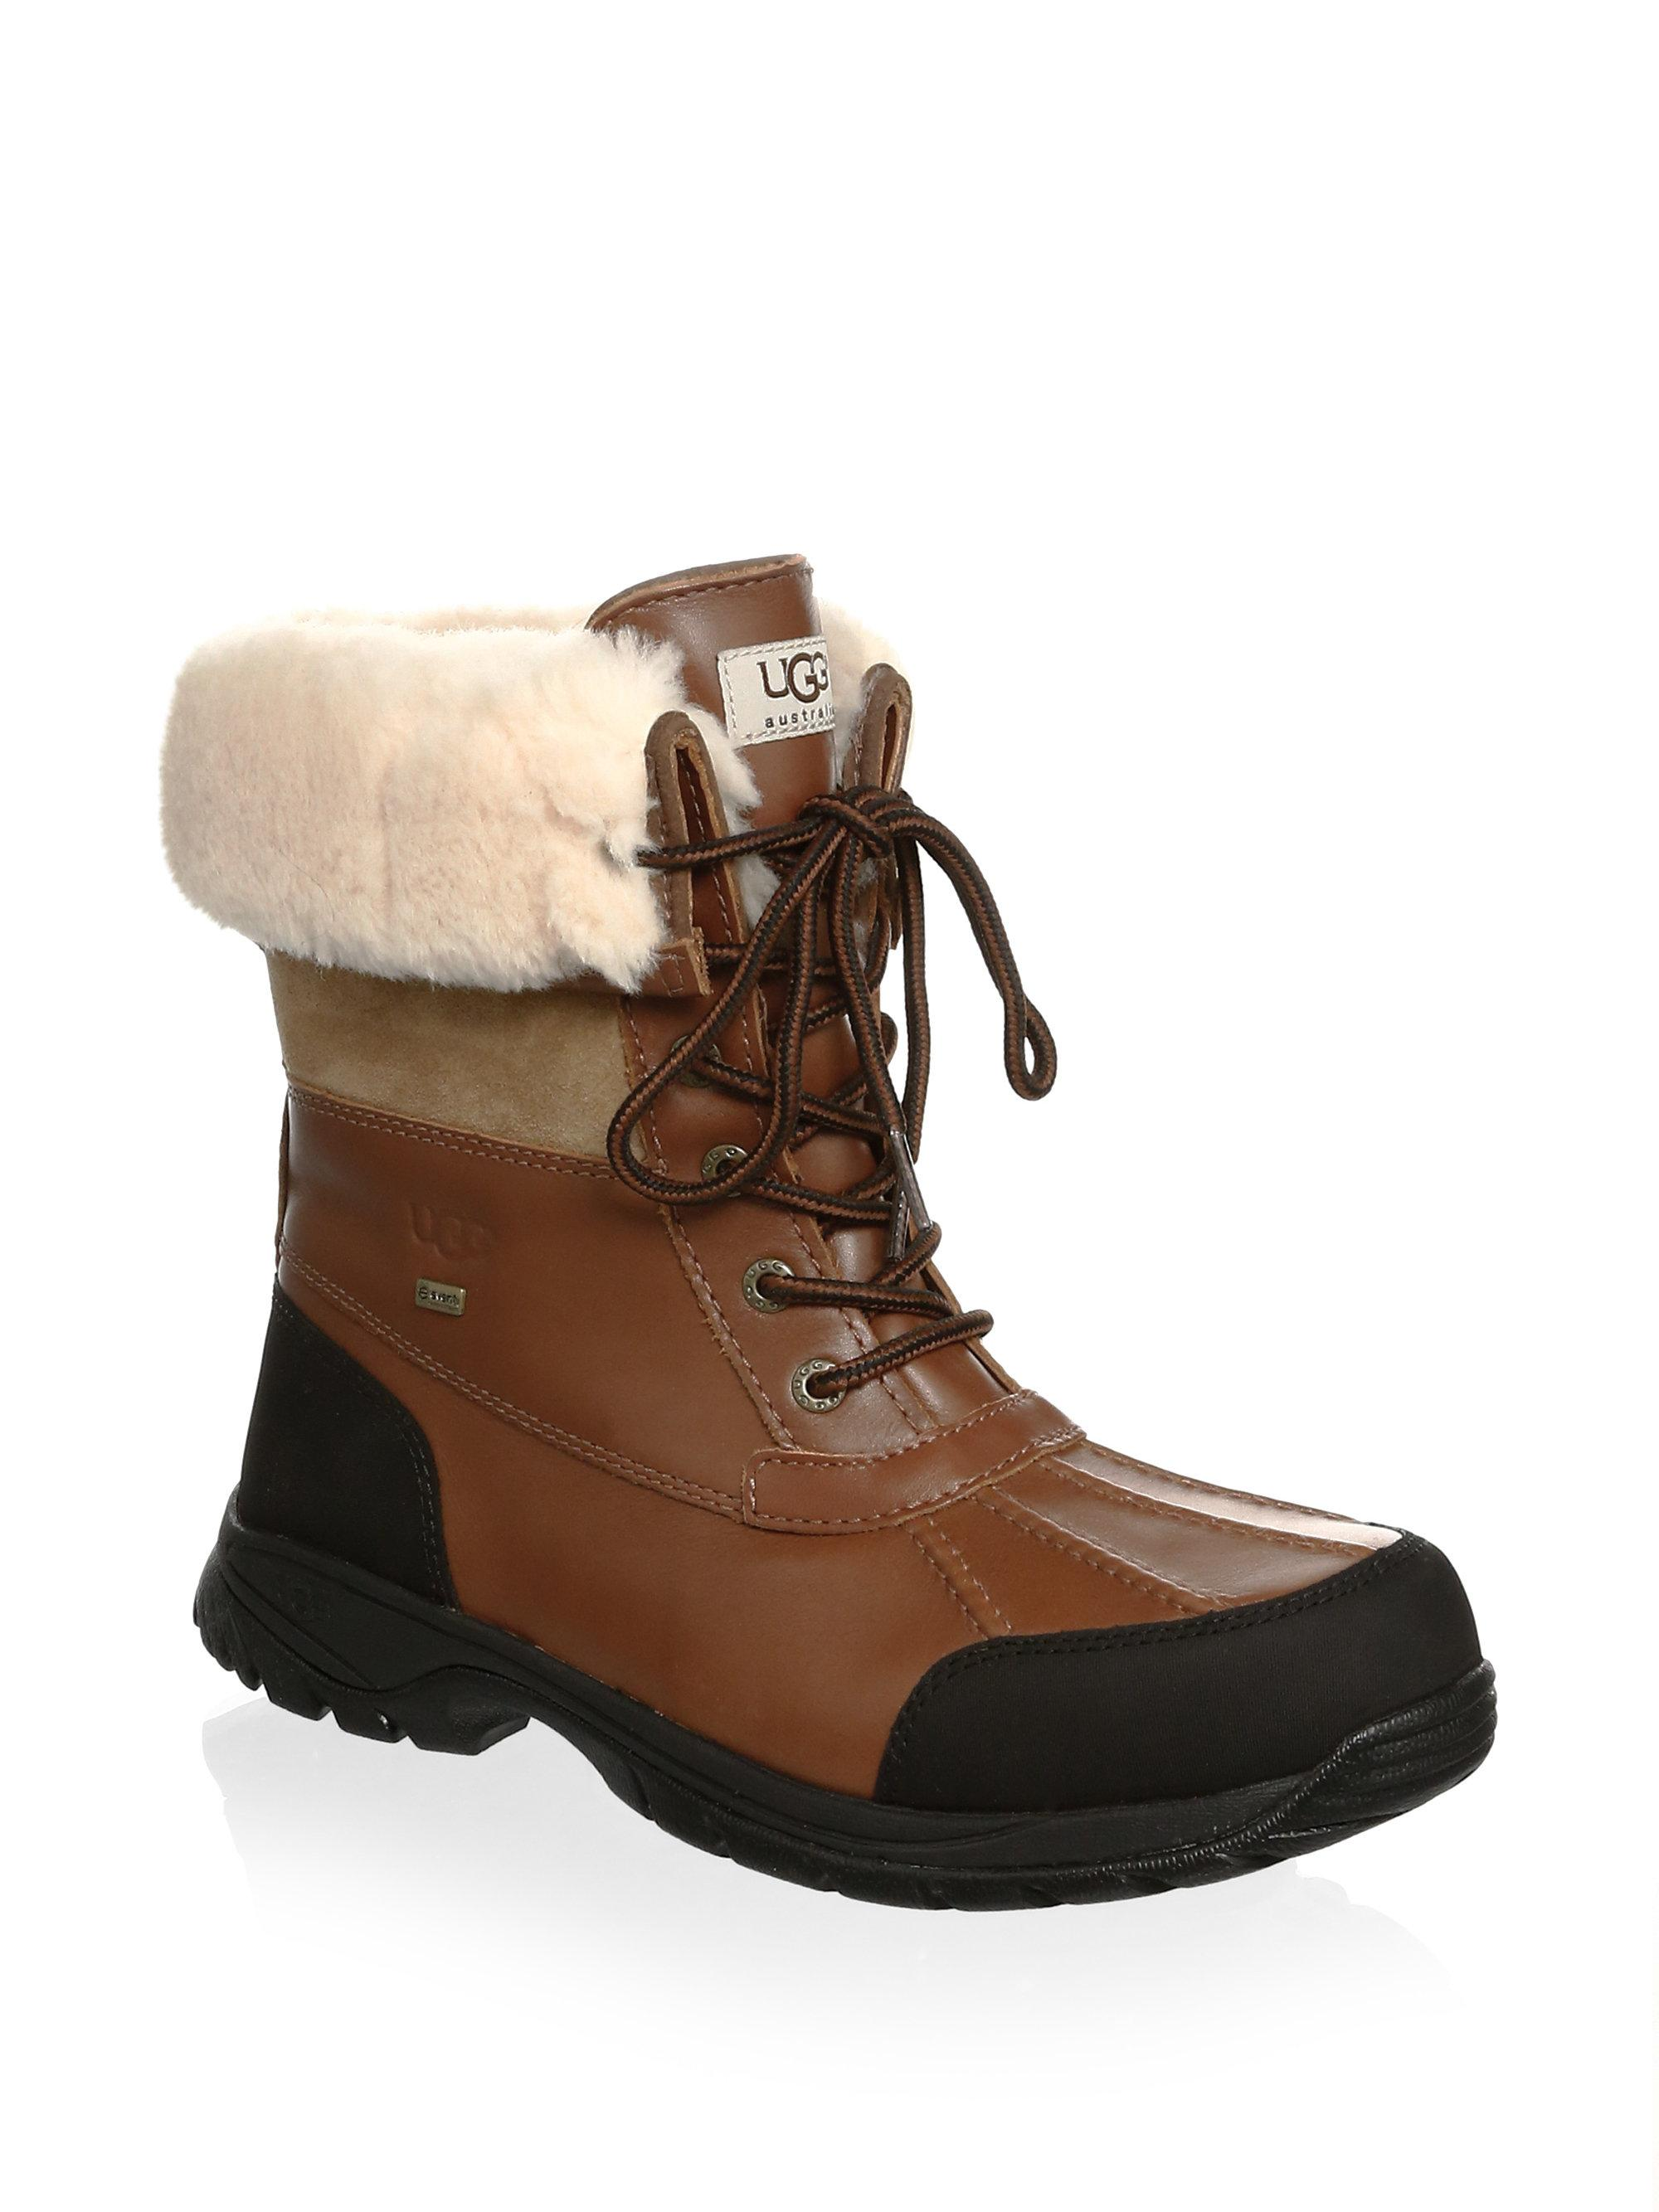 UGG Butte Sheepskin Leather Boots 3mlZBcH